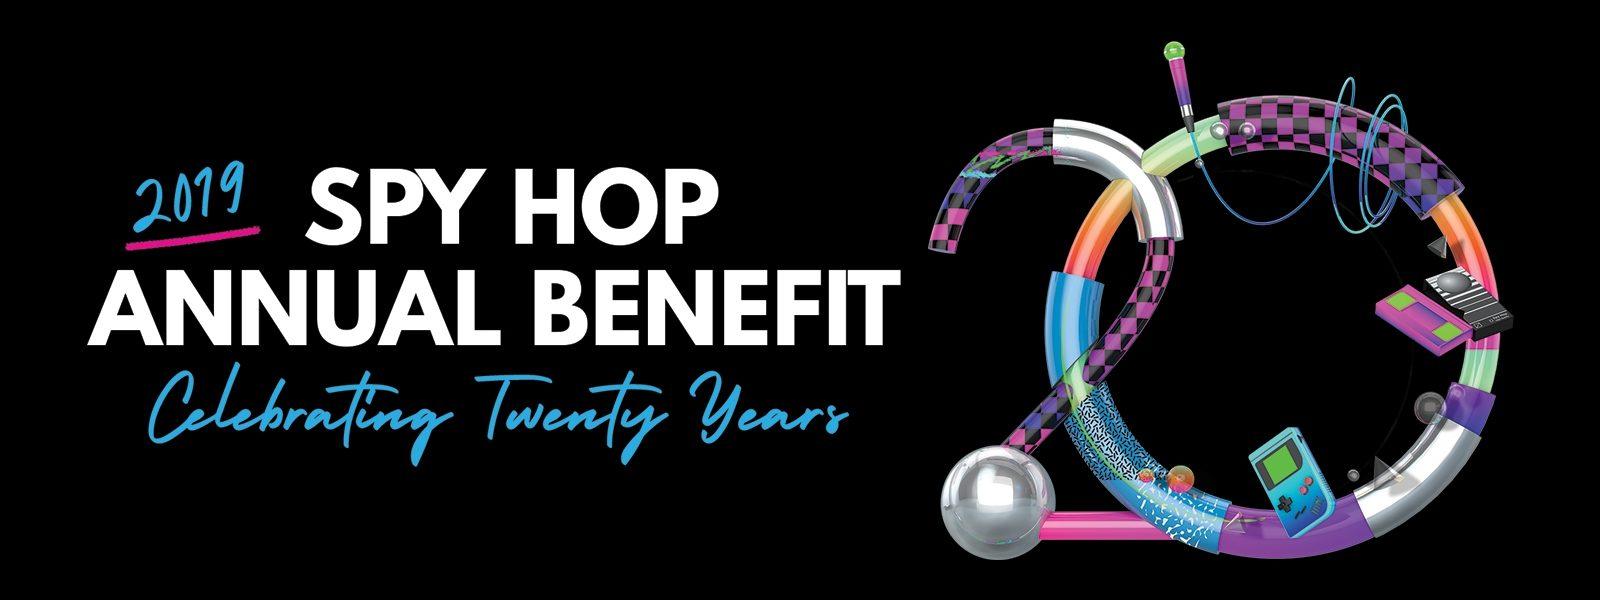 2019_Annual-Benefit_Eventpage_1600x600_Header